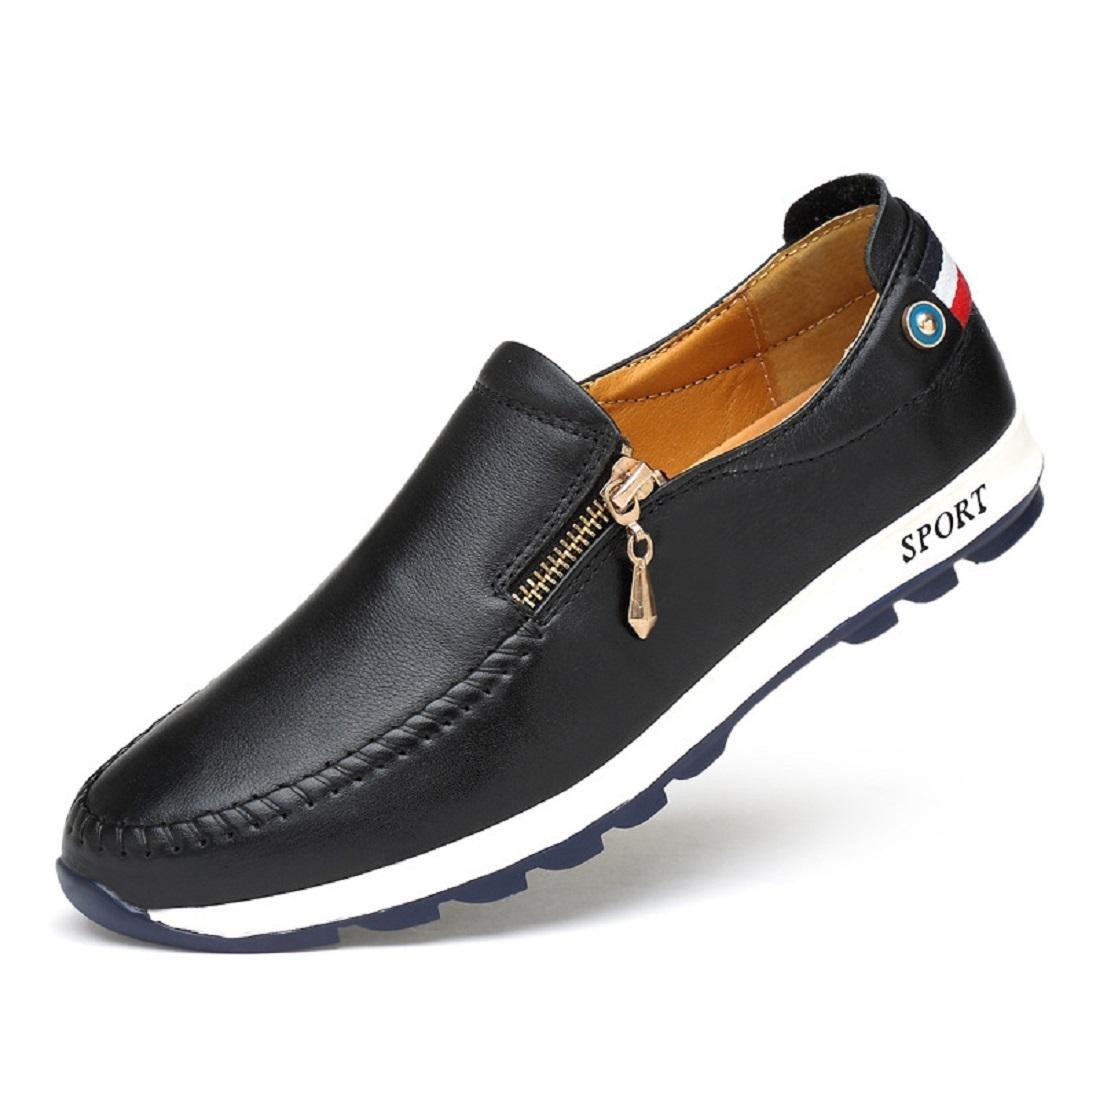 Herren Mode Freizeit Lederschuhe Geschäft Lässige Schuhe Flache Schuhe Atmungsaktiv Licht Gemütlich EUR GRÖSSE 39-44